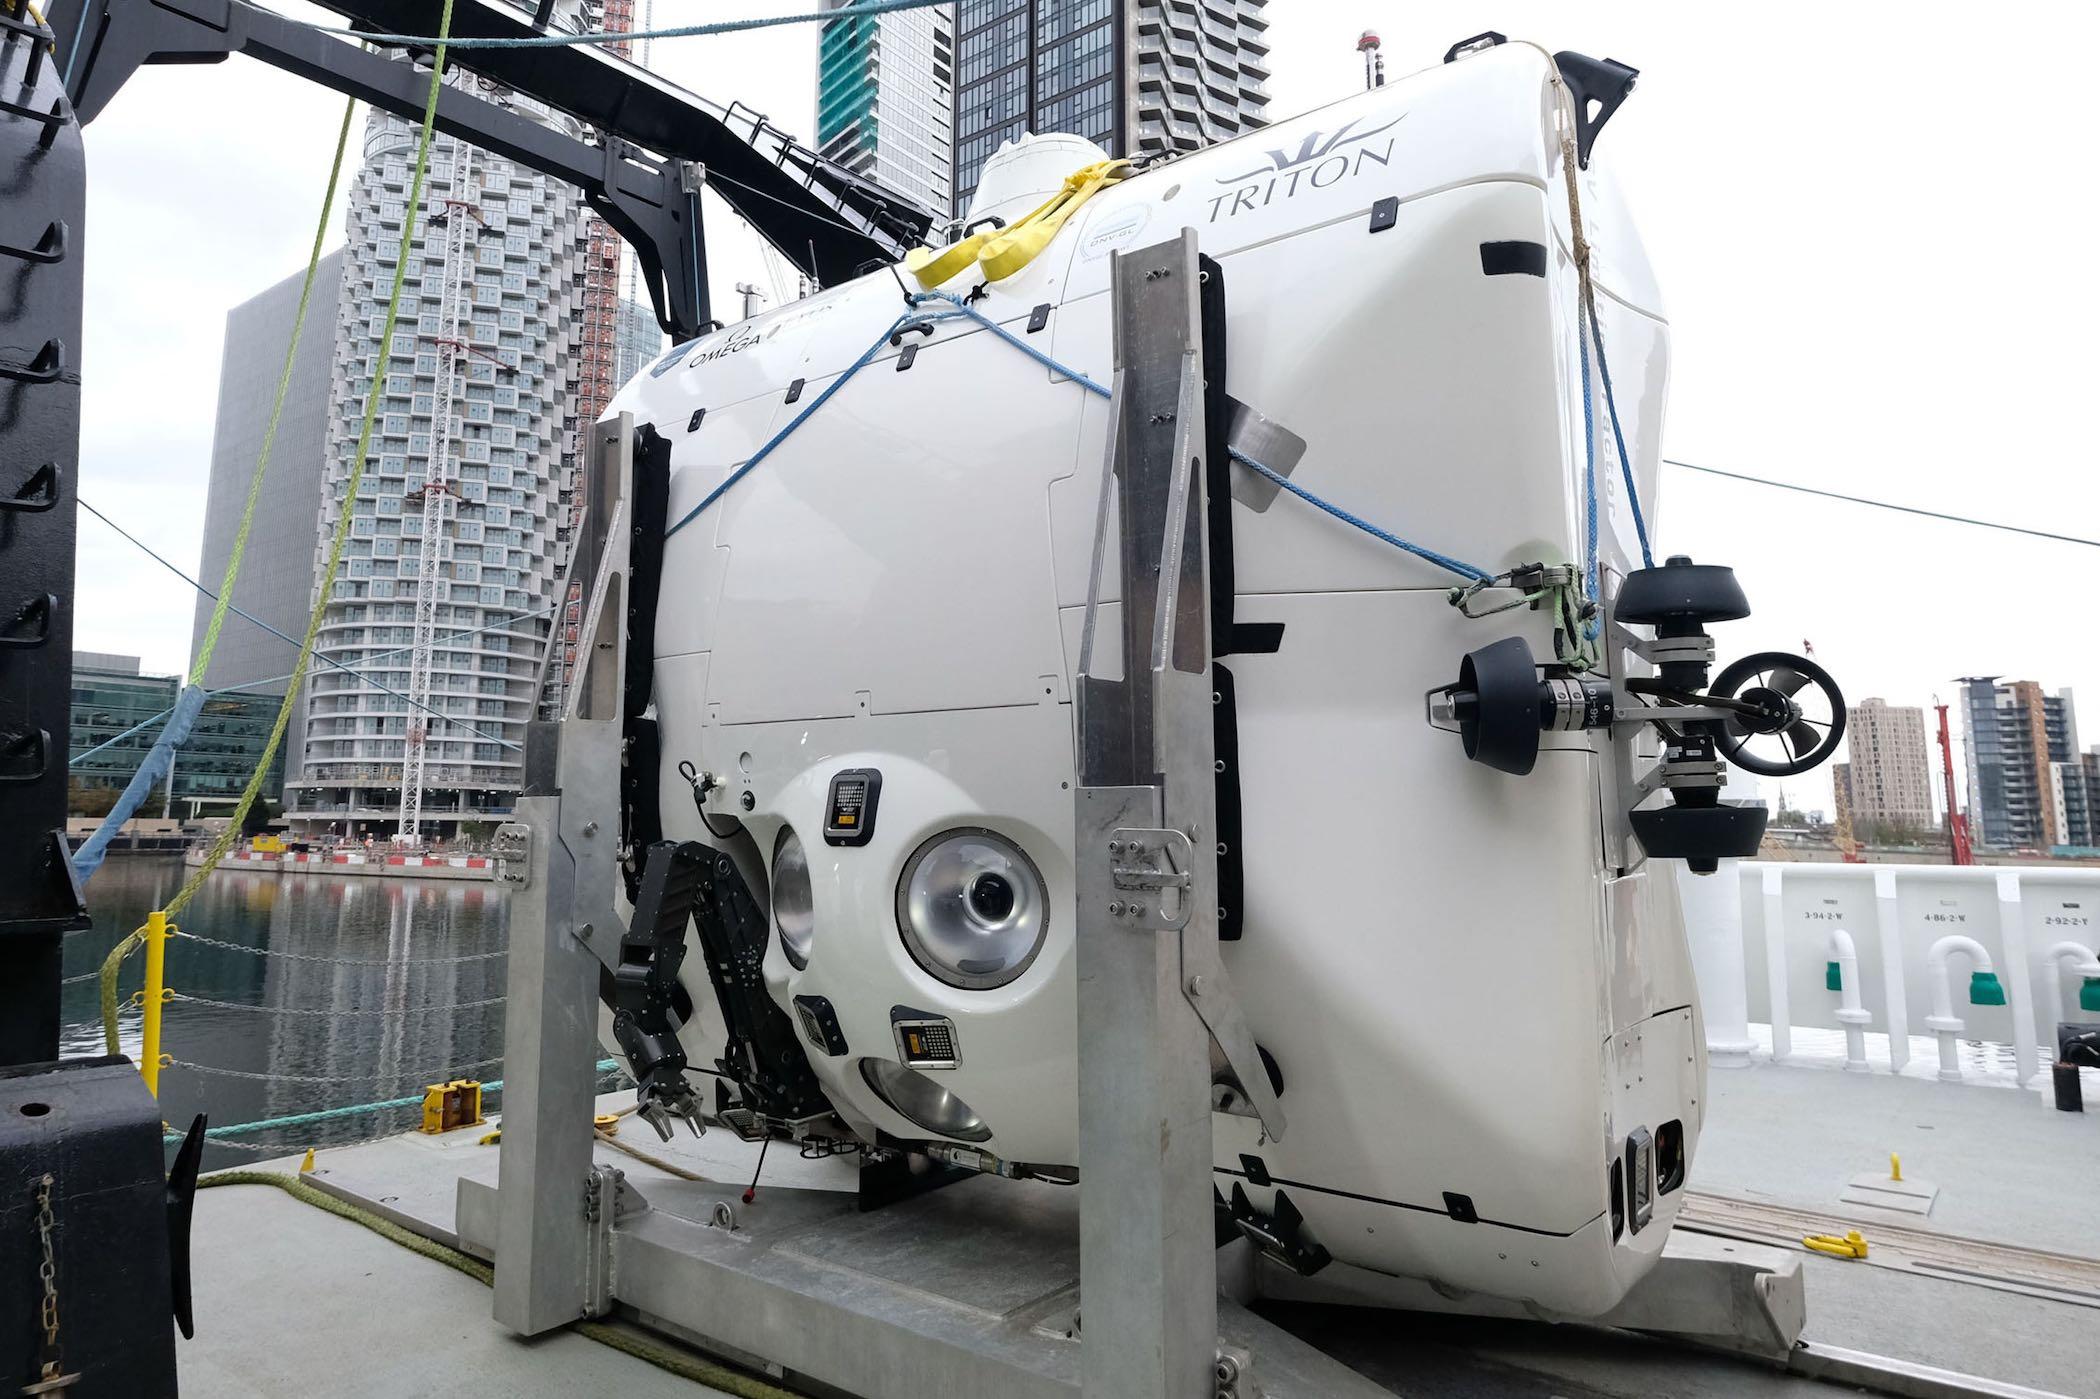 Omega Seamaster Ultra Deep - Five Deeps expedition